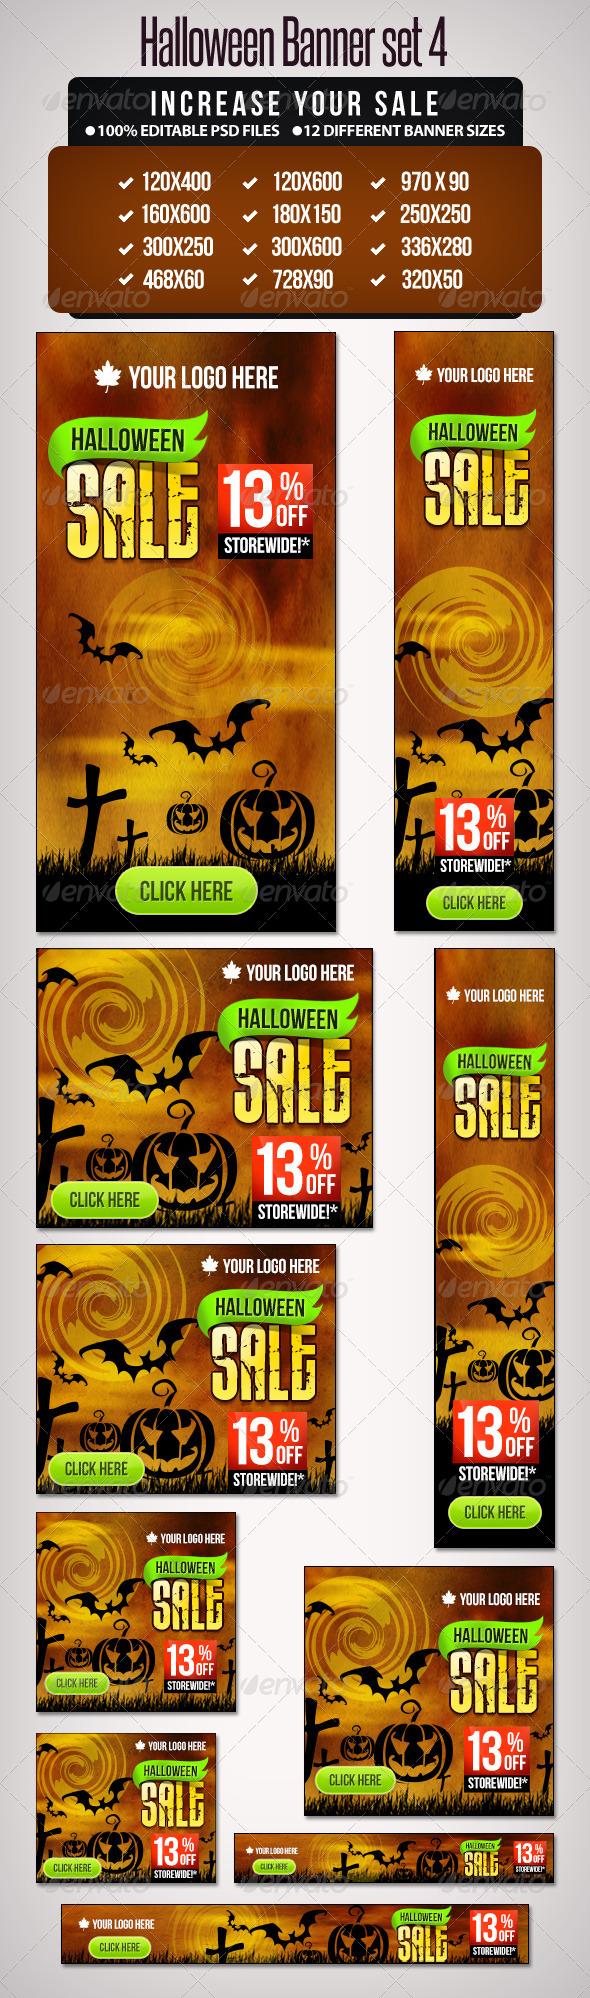 GraphicRiver Halloween Banner Set 4 12 Google Standard Sizes 5729134